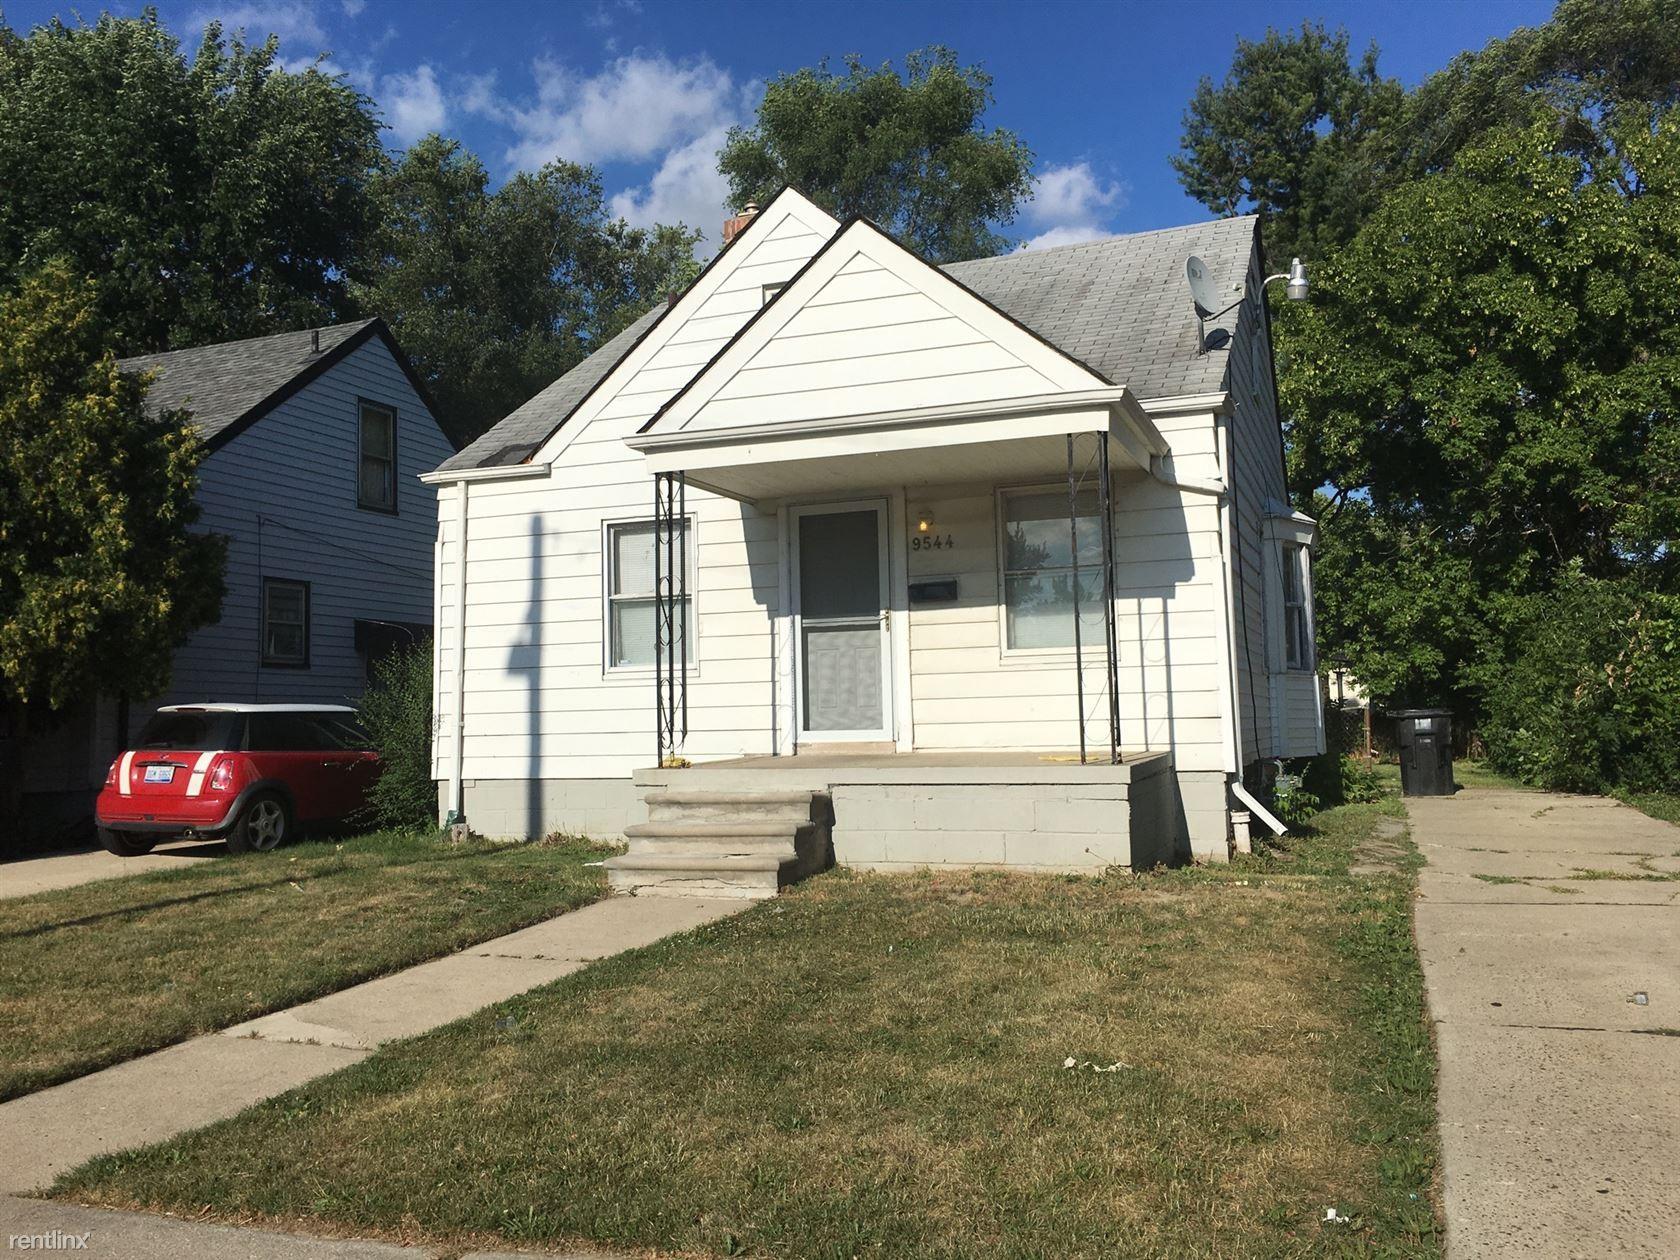 Chicago W Detroit Mi 48228 3 Bedroom House For Rent For 600 Month Zumper